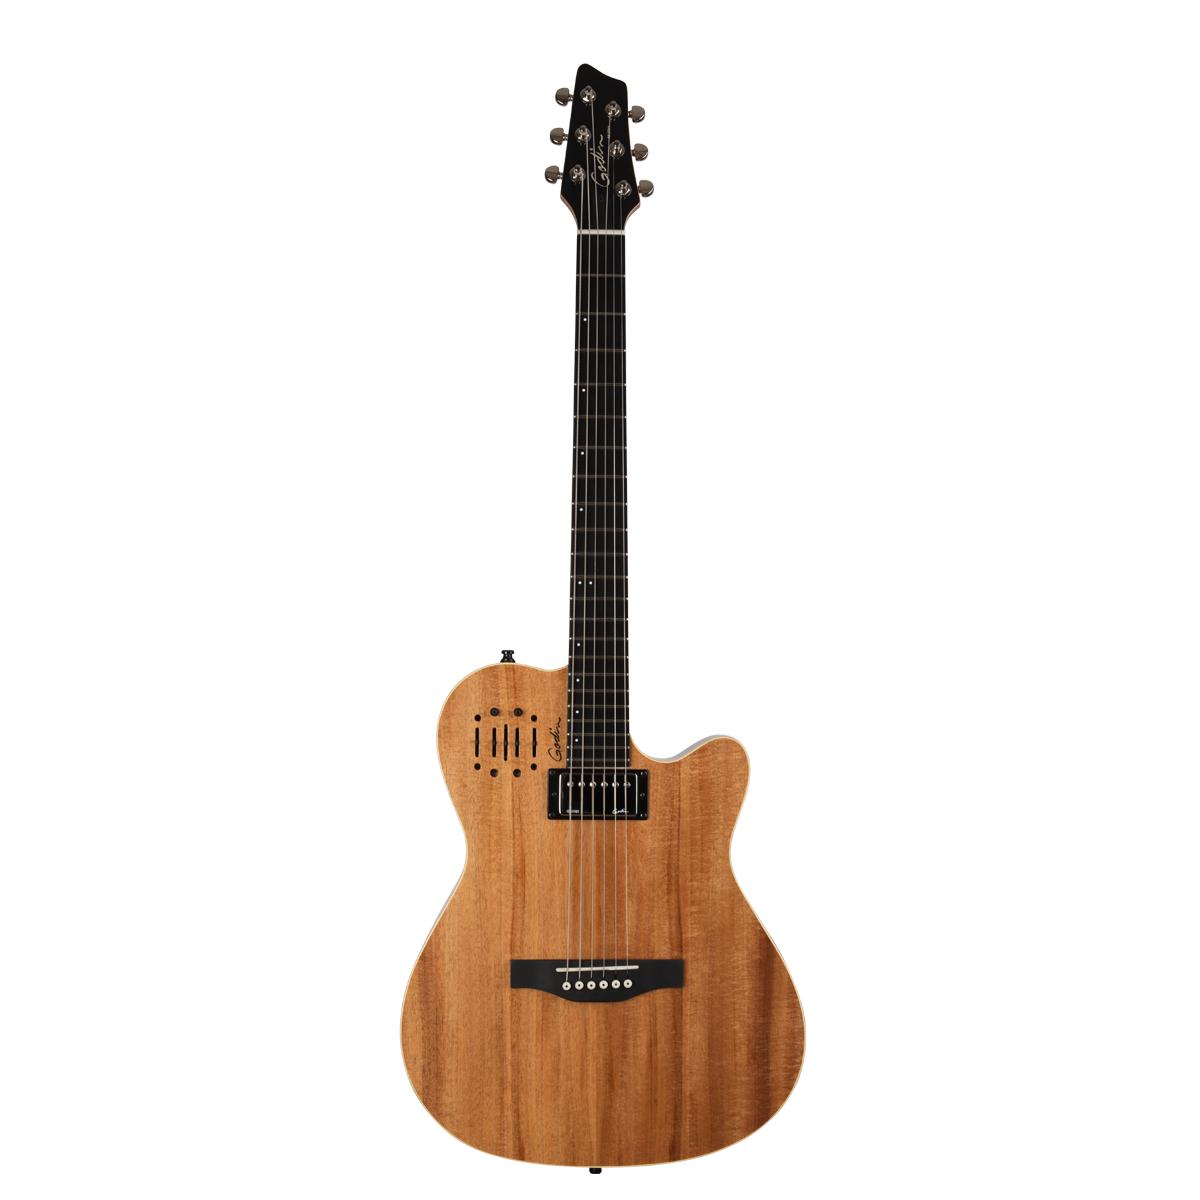 Godin 37438 A6 Ultra Koa Acoustic Electric Guitar